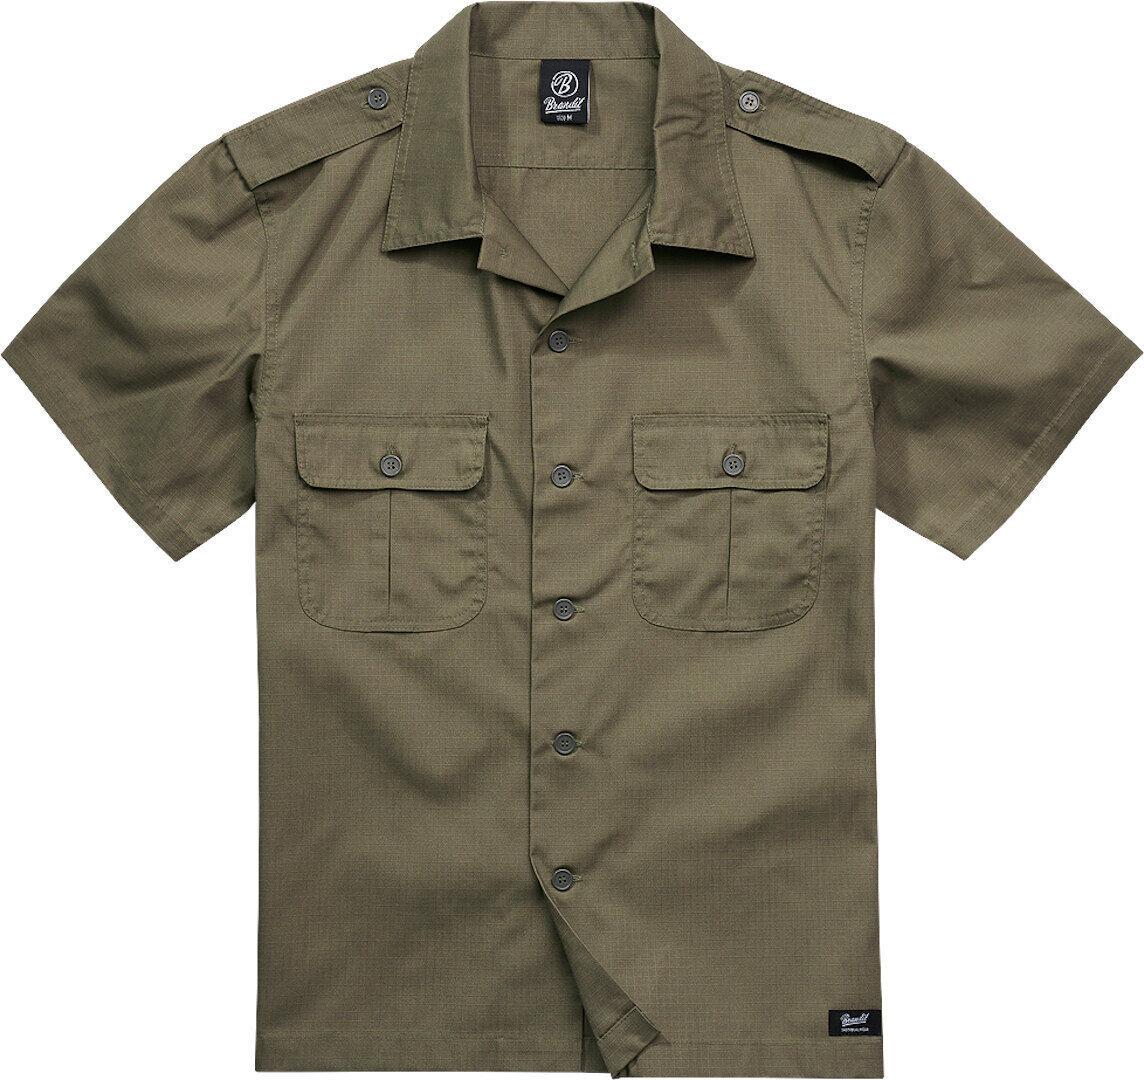 Brandit US Ripstop Paita  - Vihreä - Size: 3XL